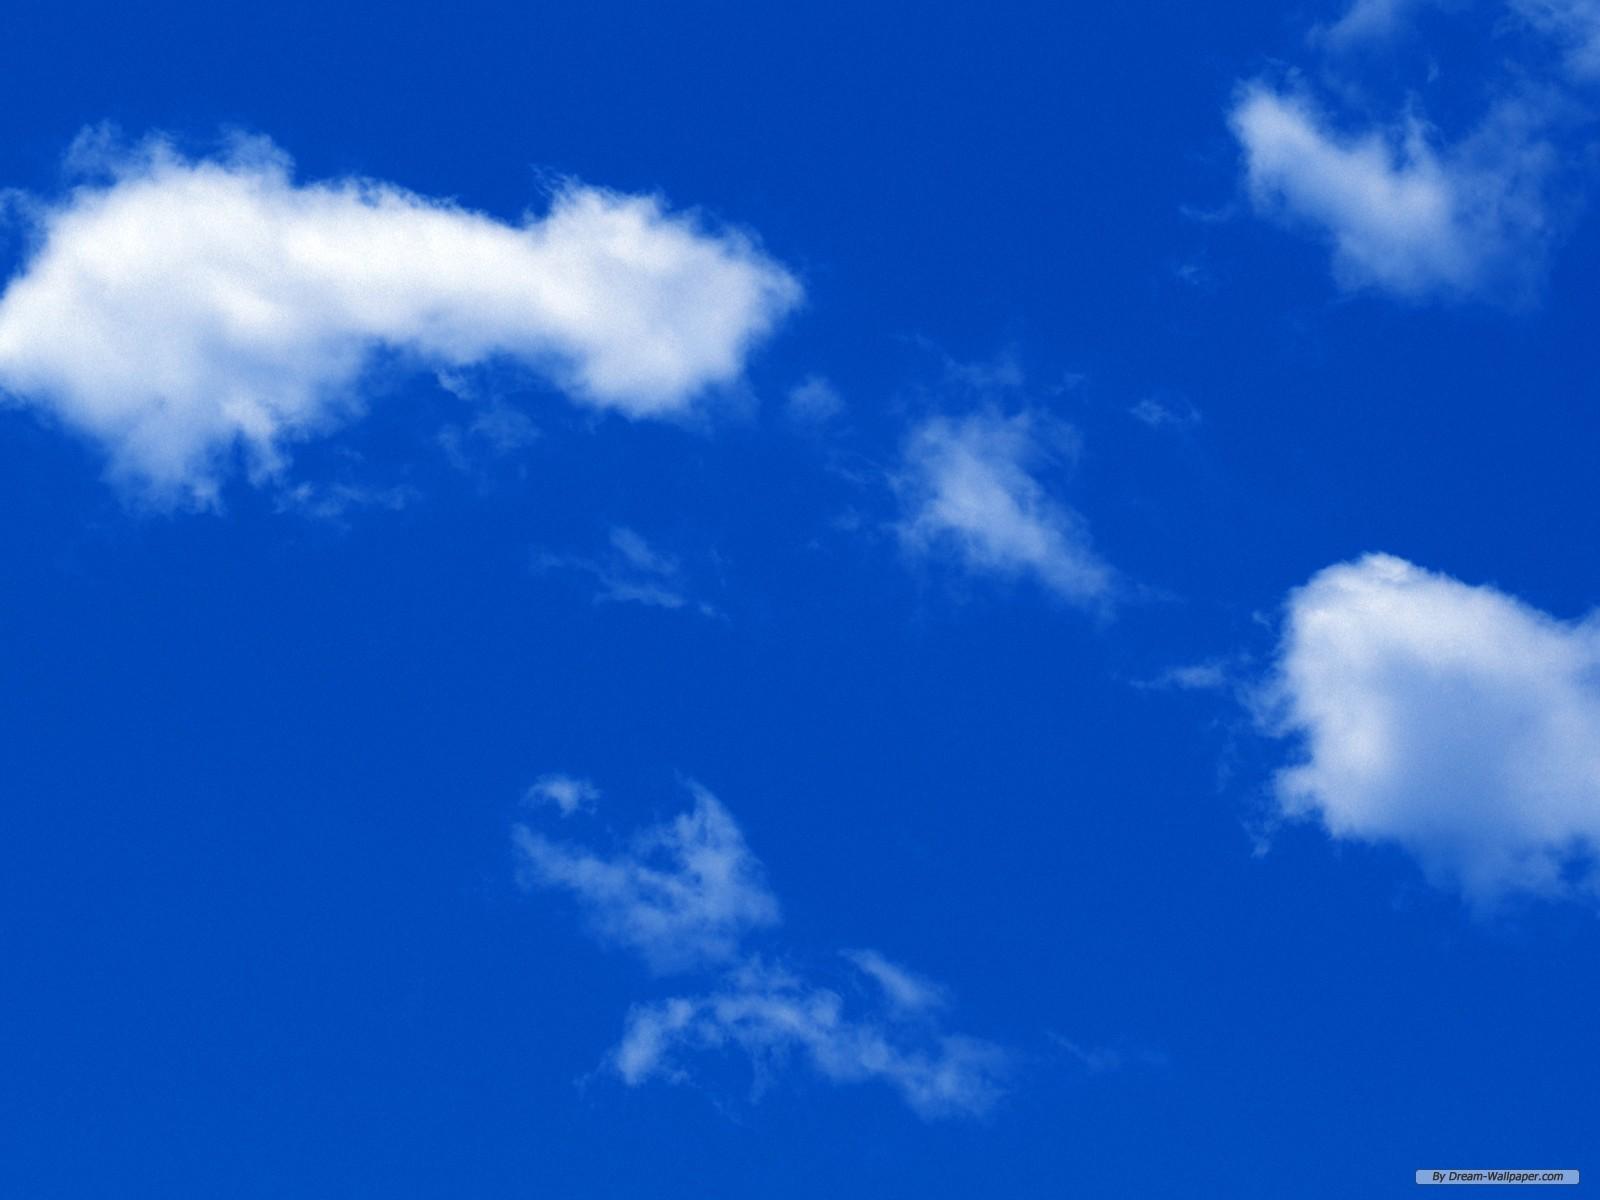 wallpaper   Blue Sky And White Cloud 8 wallpaper   1600x1200 wallpaper 1600x1200